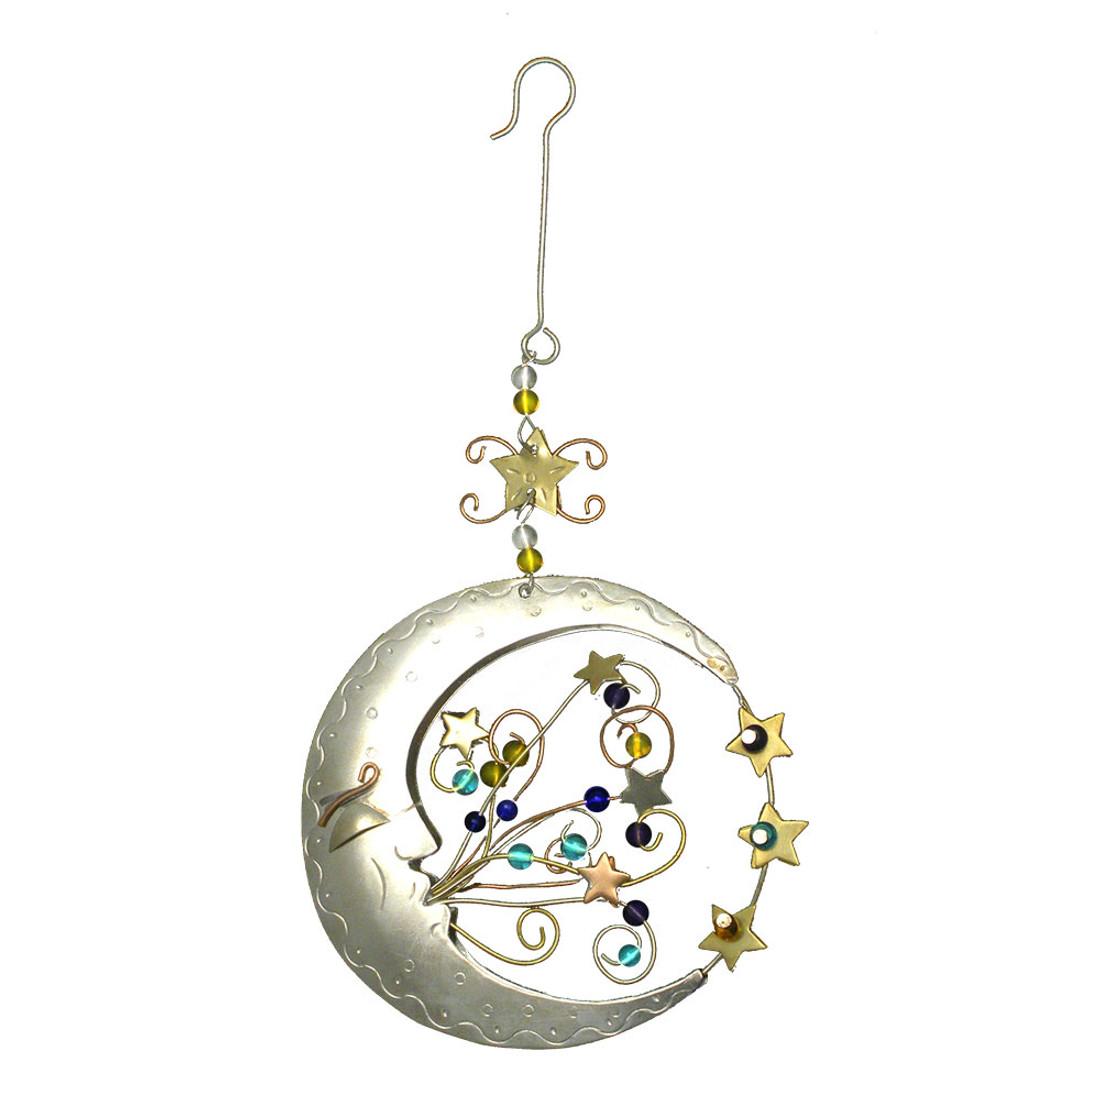 Magic moon metal Christmas ornament.